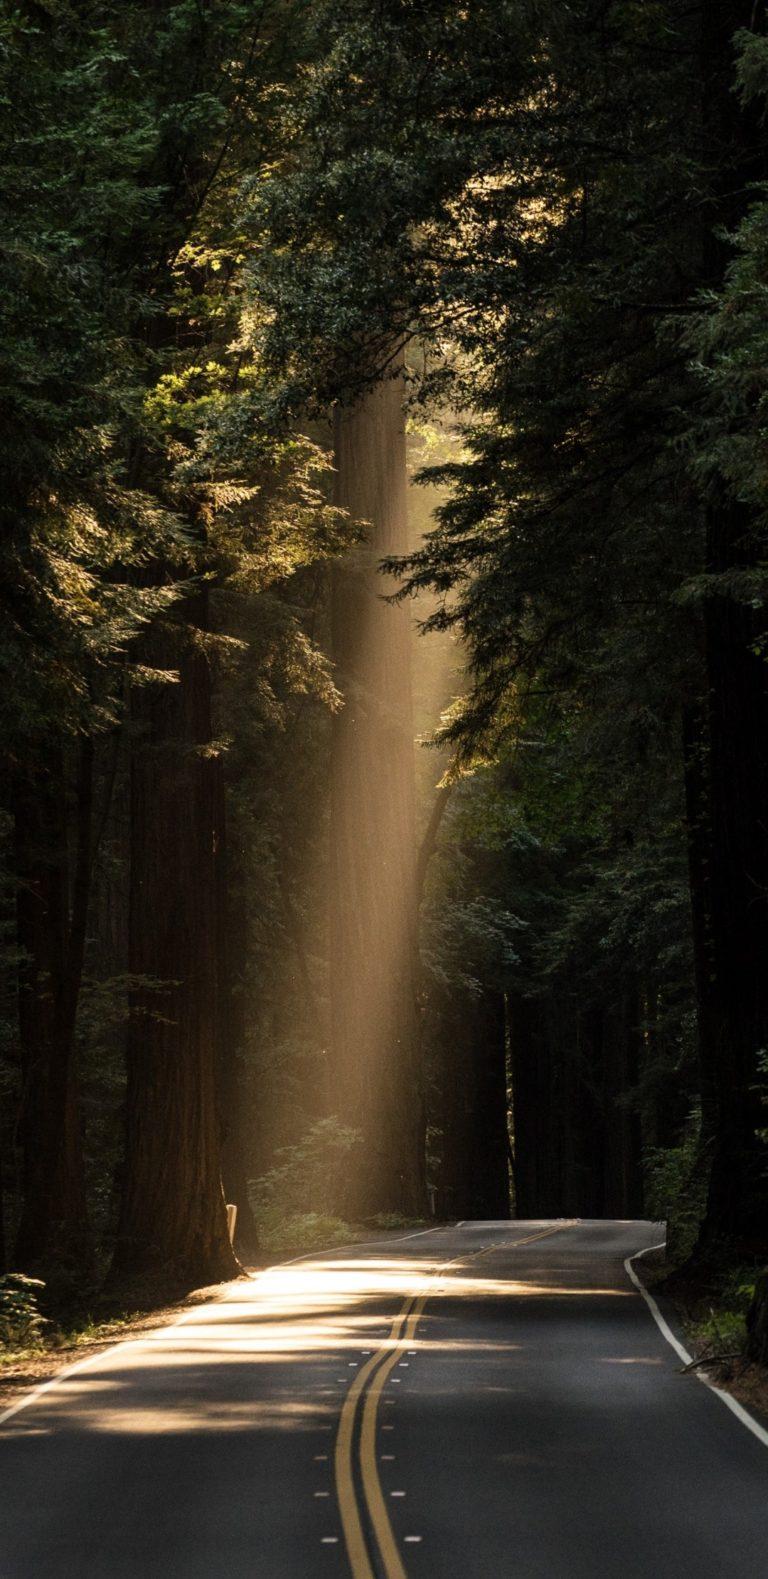 Conifer Daylight Evergreen Forest Highway 1080x2220 768x1579